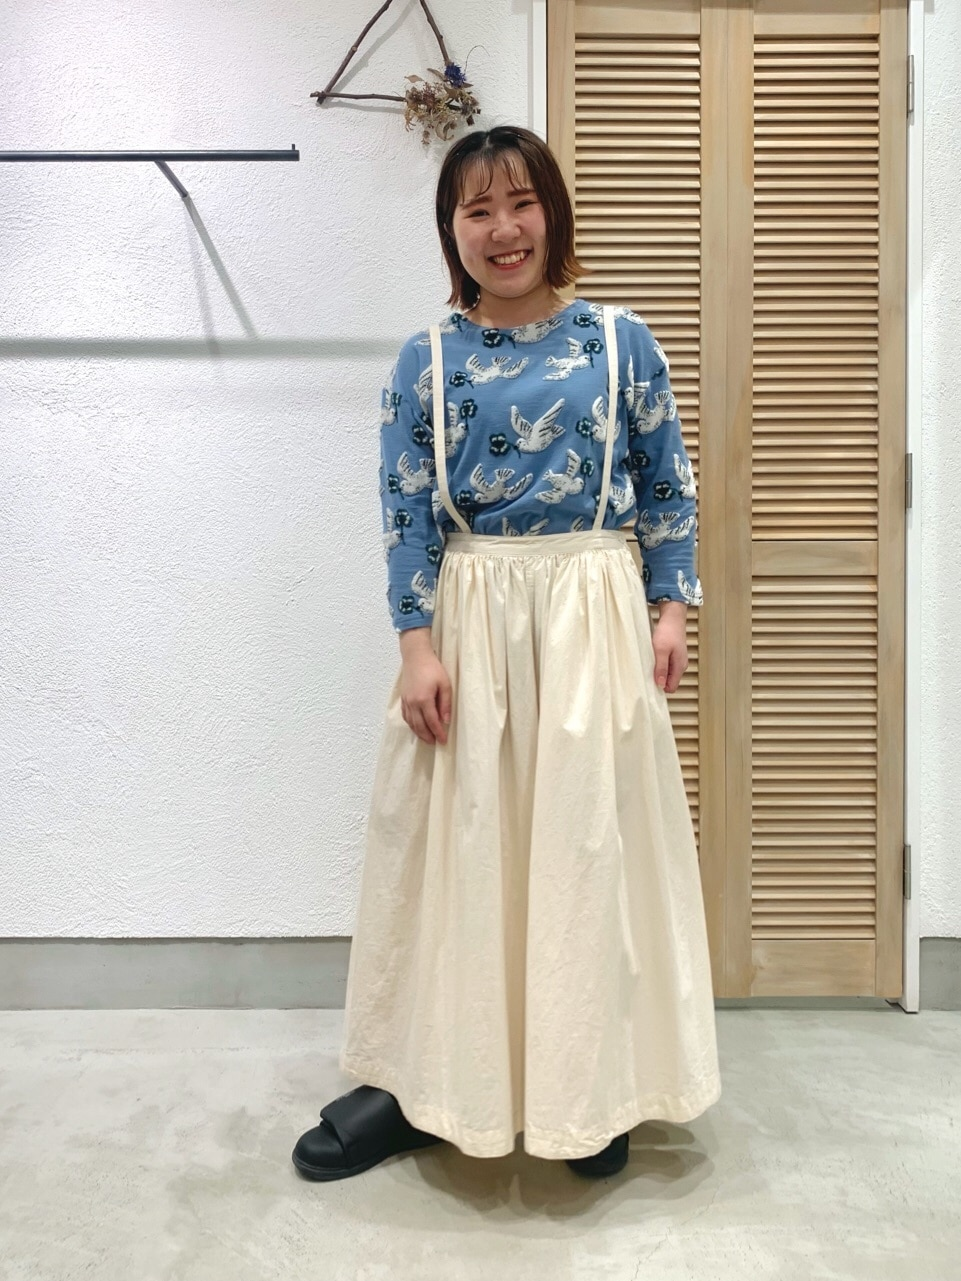 chambre de charme 横浜ジョイナス 身長:155cm 2021.02.12